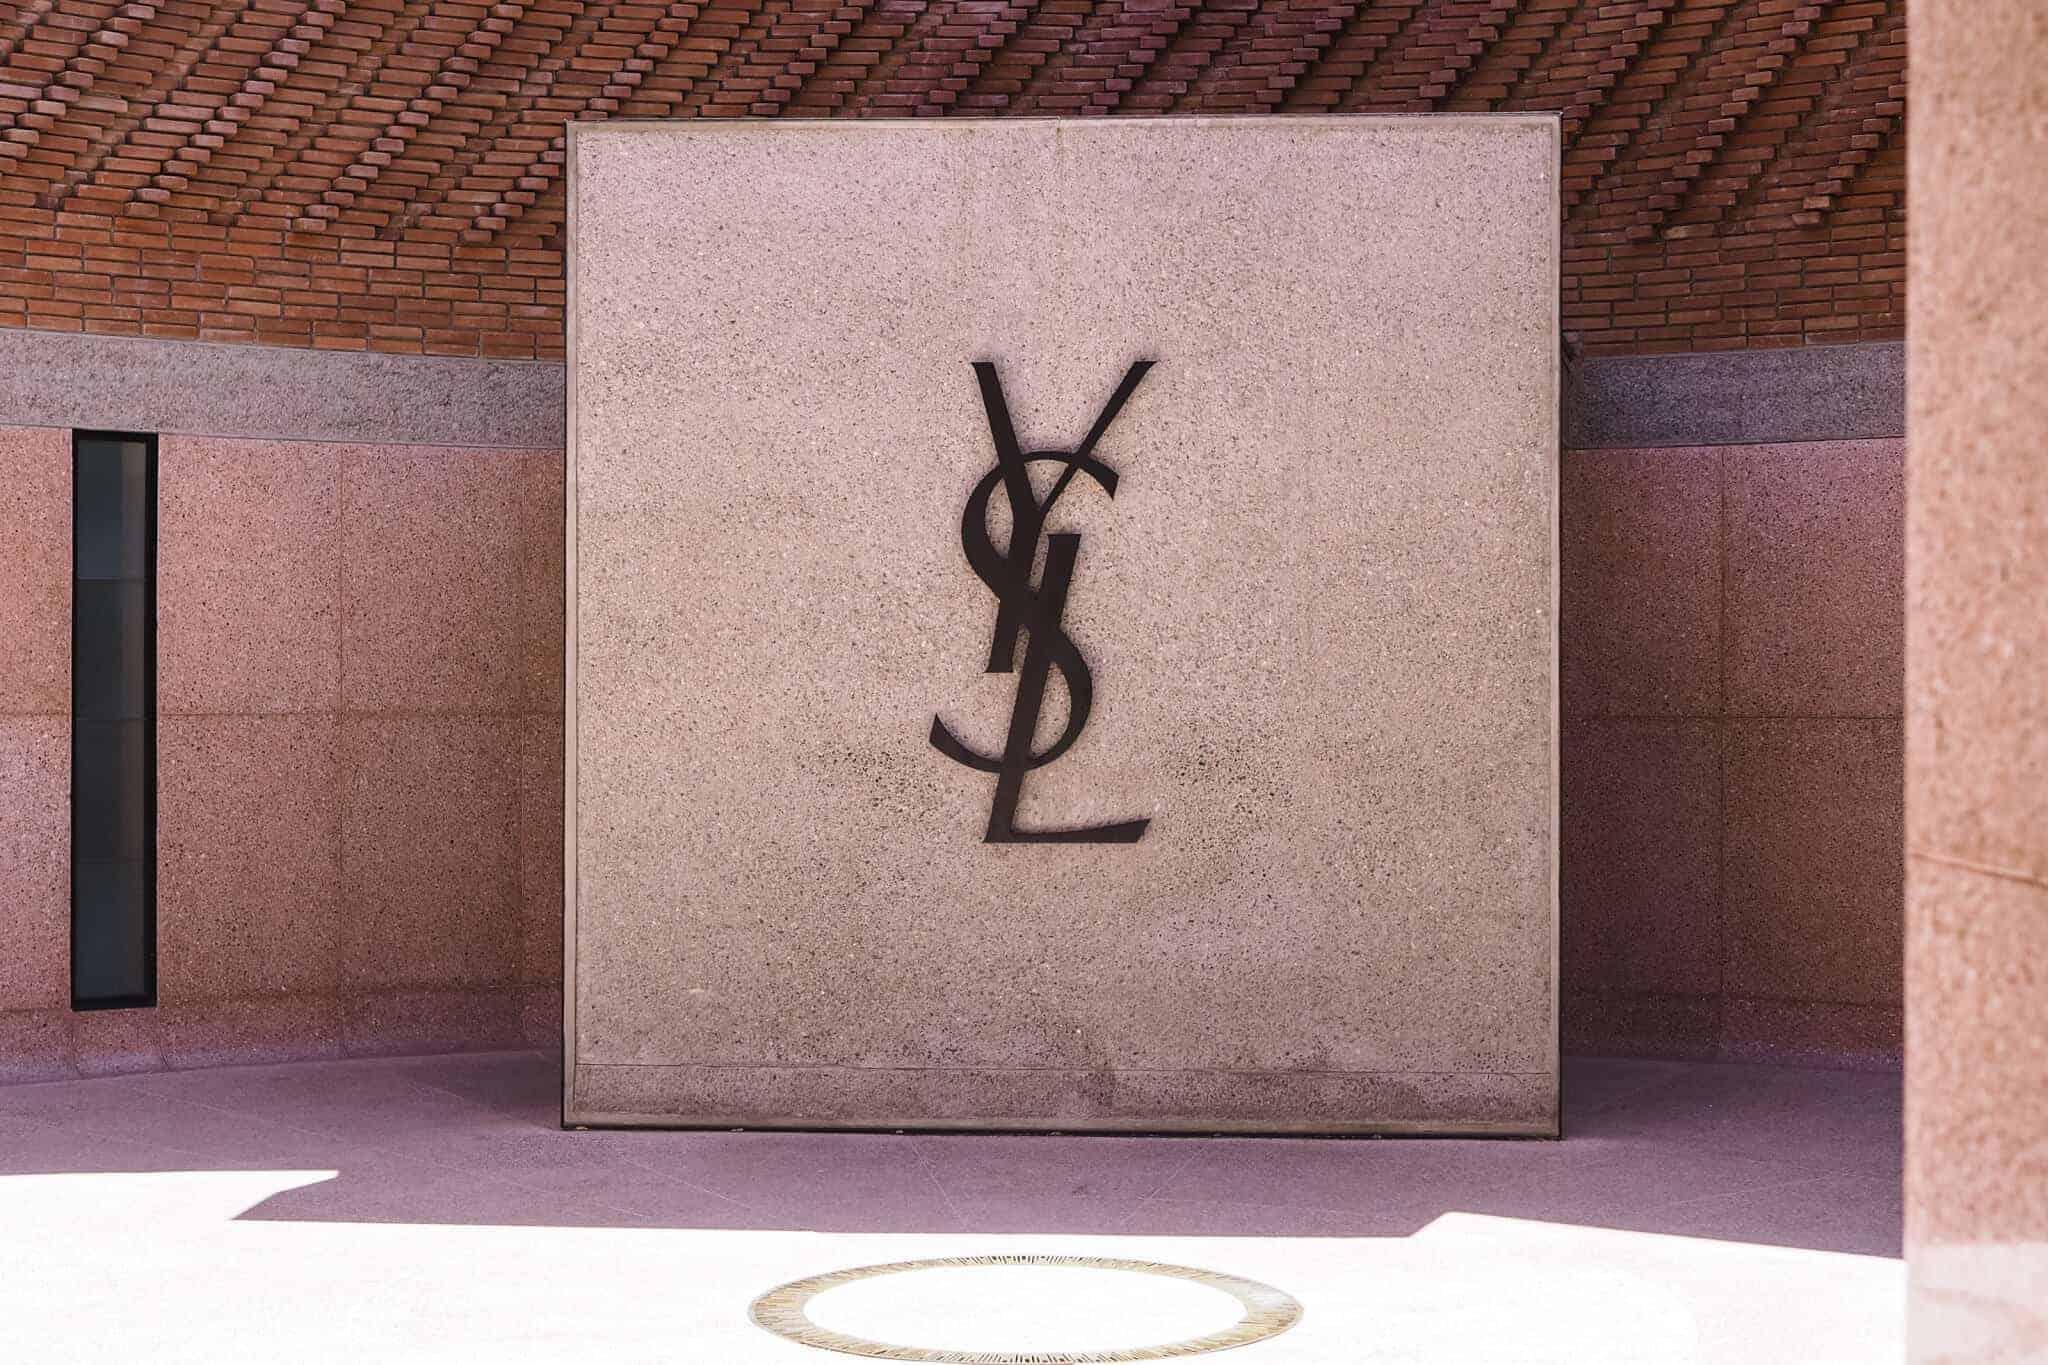 ysl museum courtyard